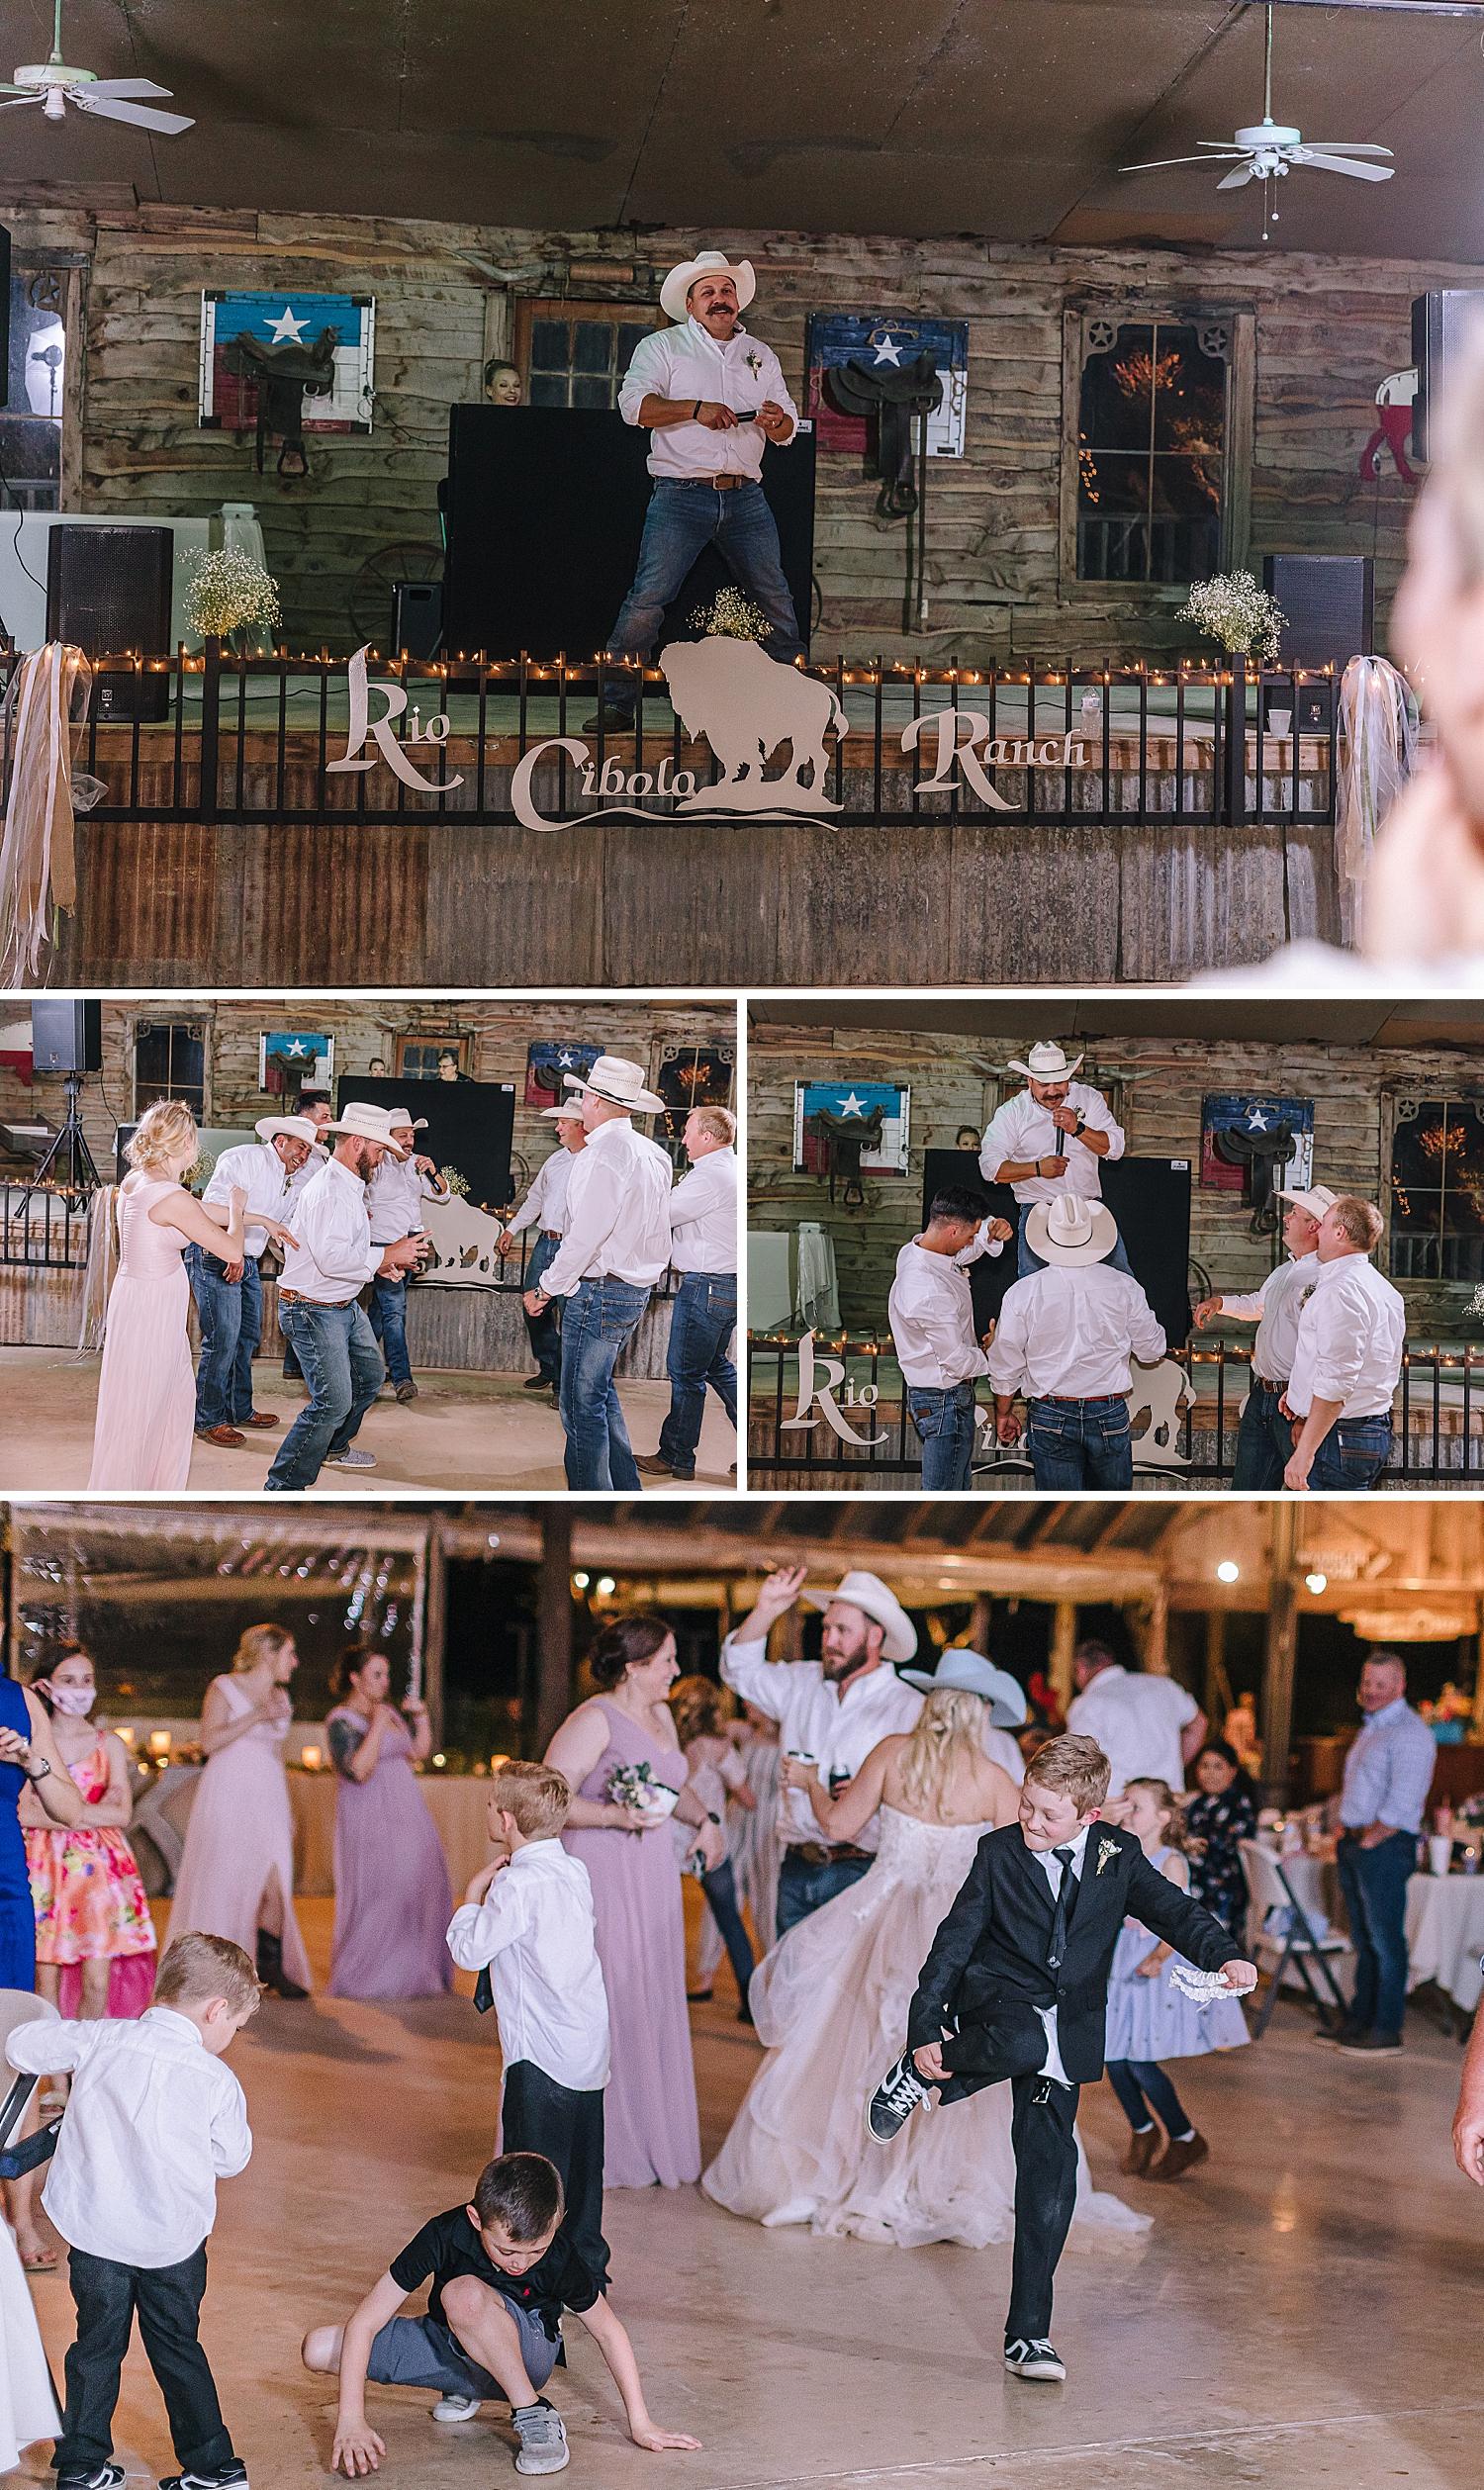 Rio-Cibilo-Ranch-Marion-Texas-Wedding-Rustic-Blush-Rose-Quartz-Details-Carly-Barton-Photography_0100.jpg